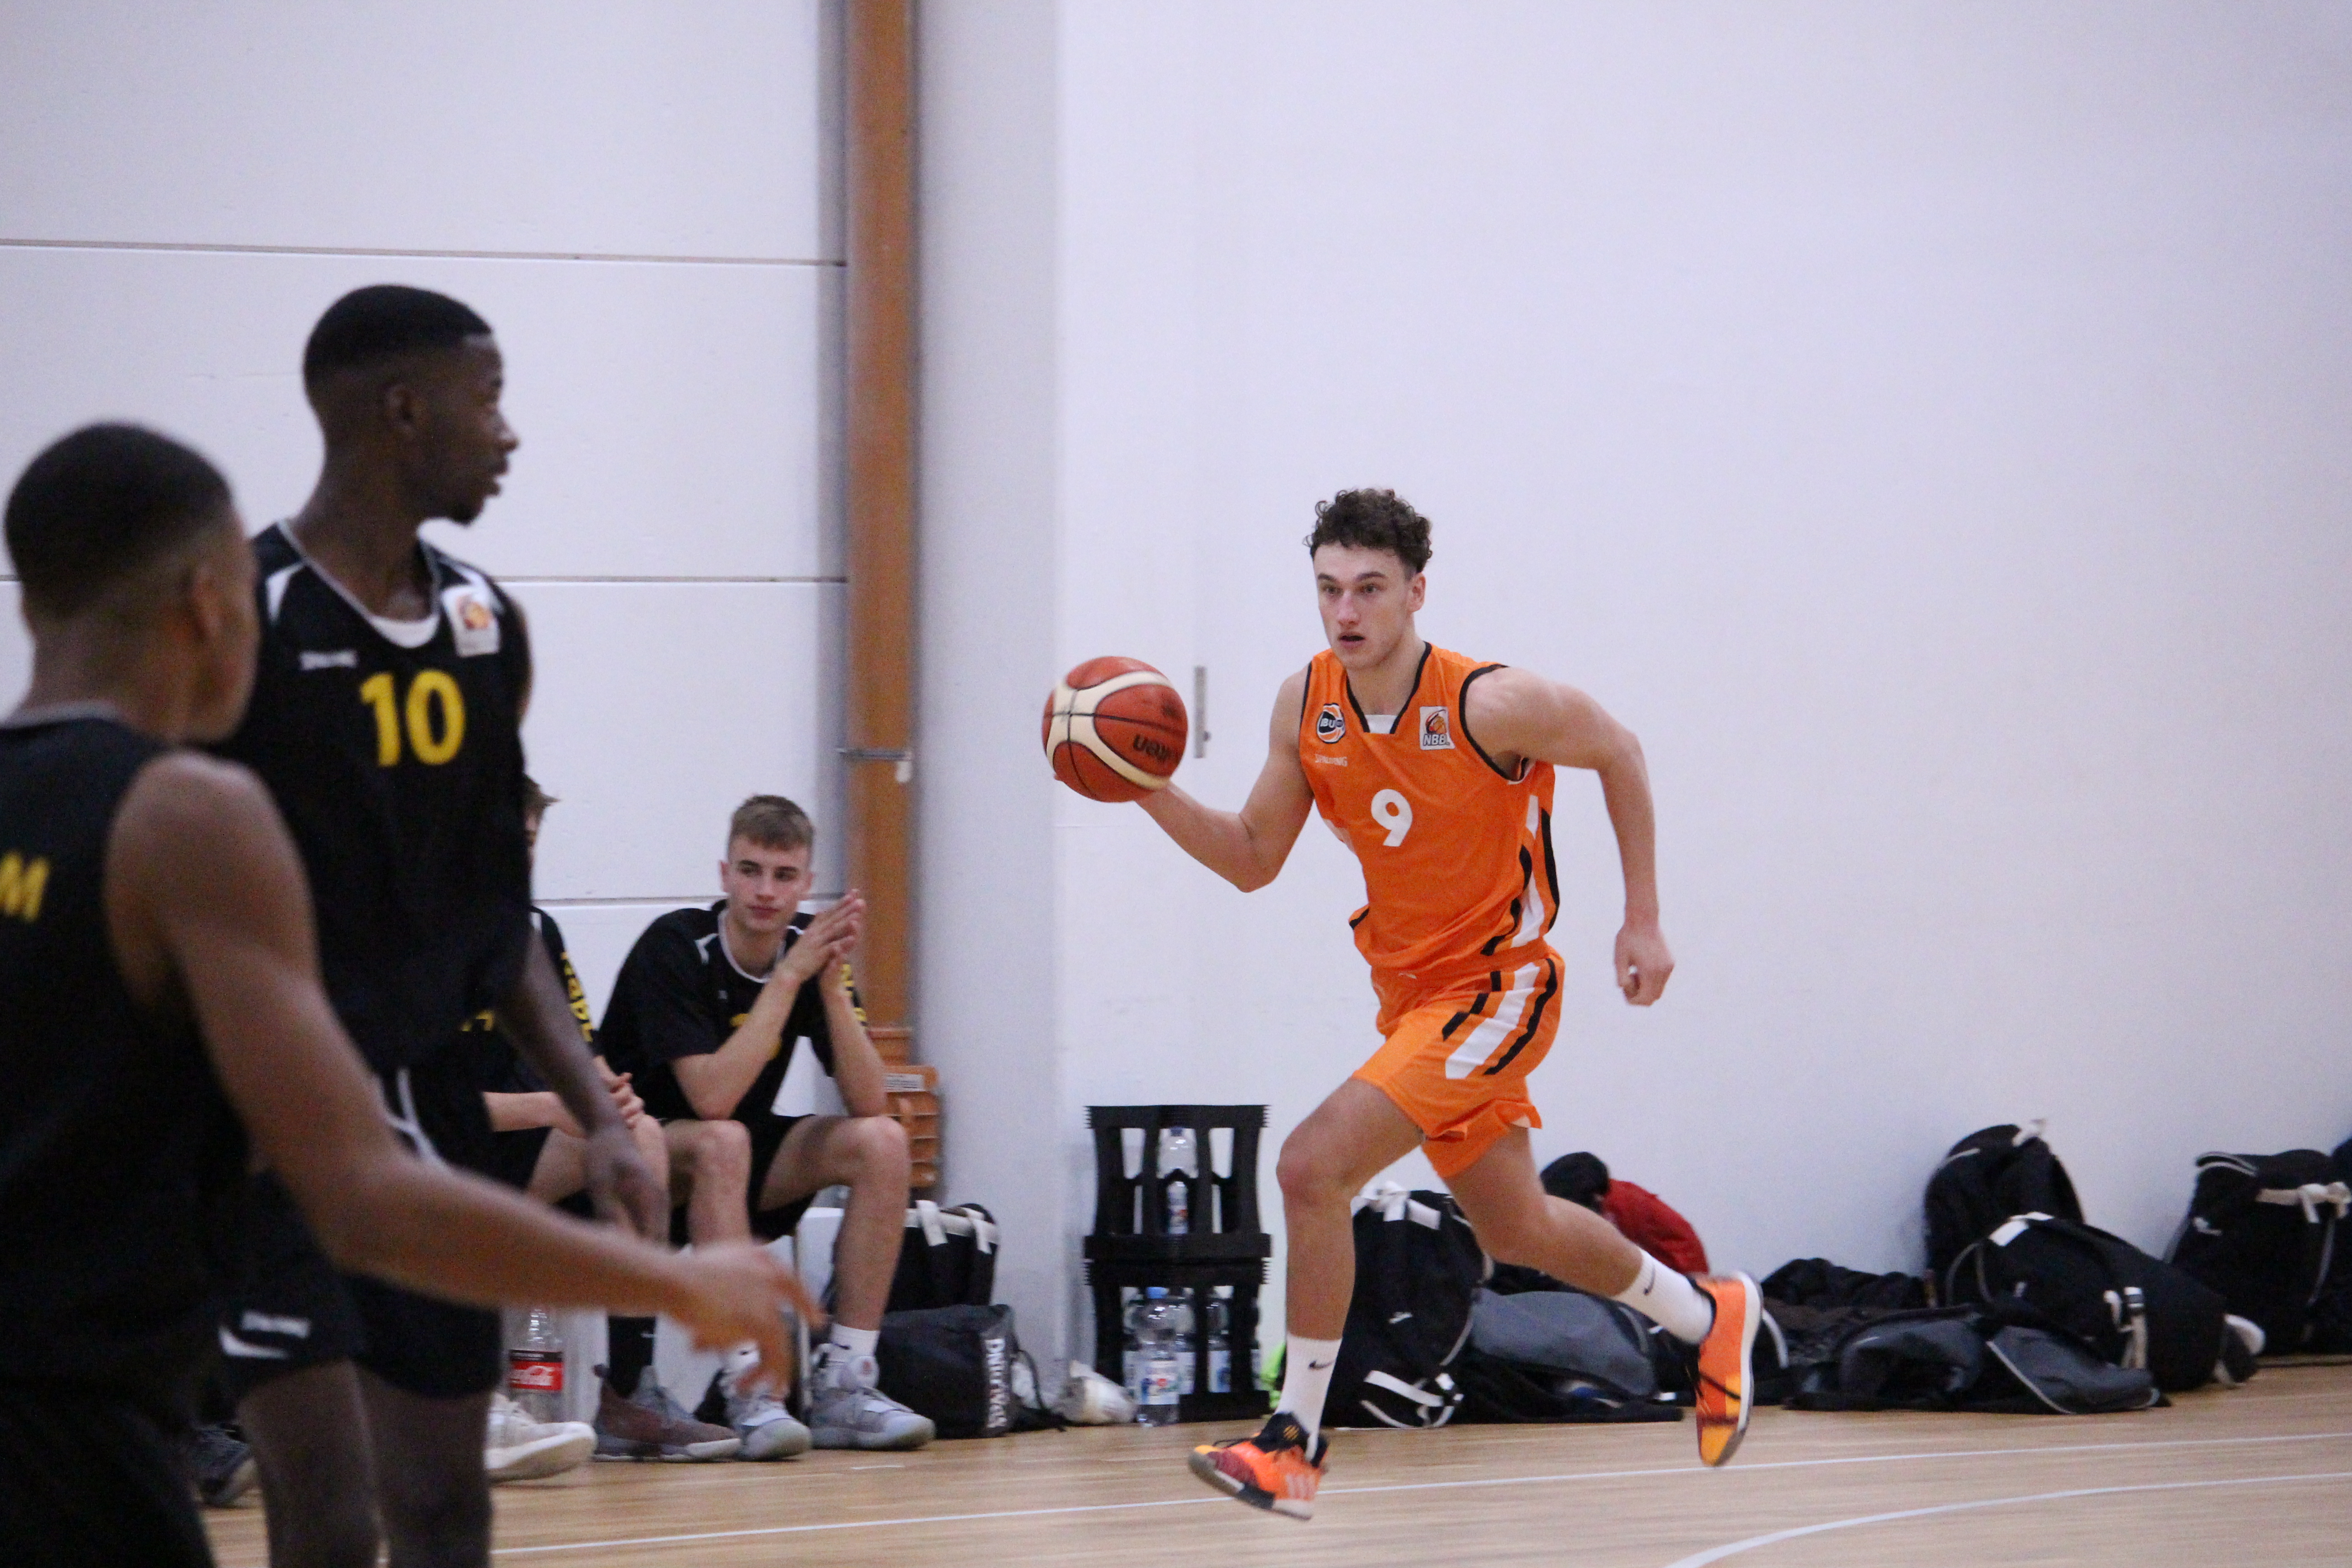 NBBL_19-20_OrangeAcademy_Young-Tigers-Tübingen_Spieltag3_Thomas-Gaus